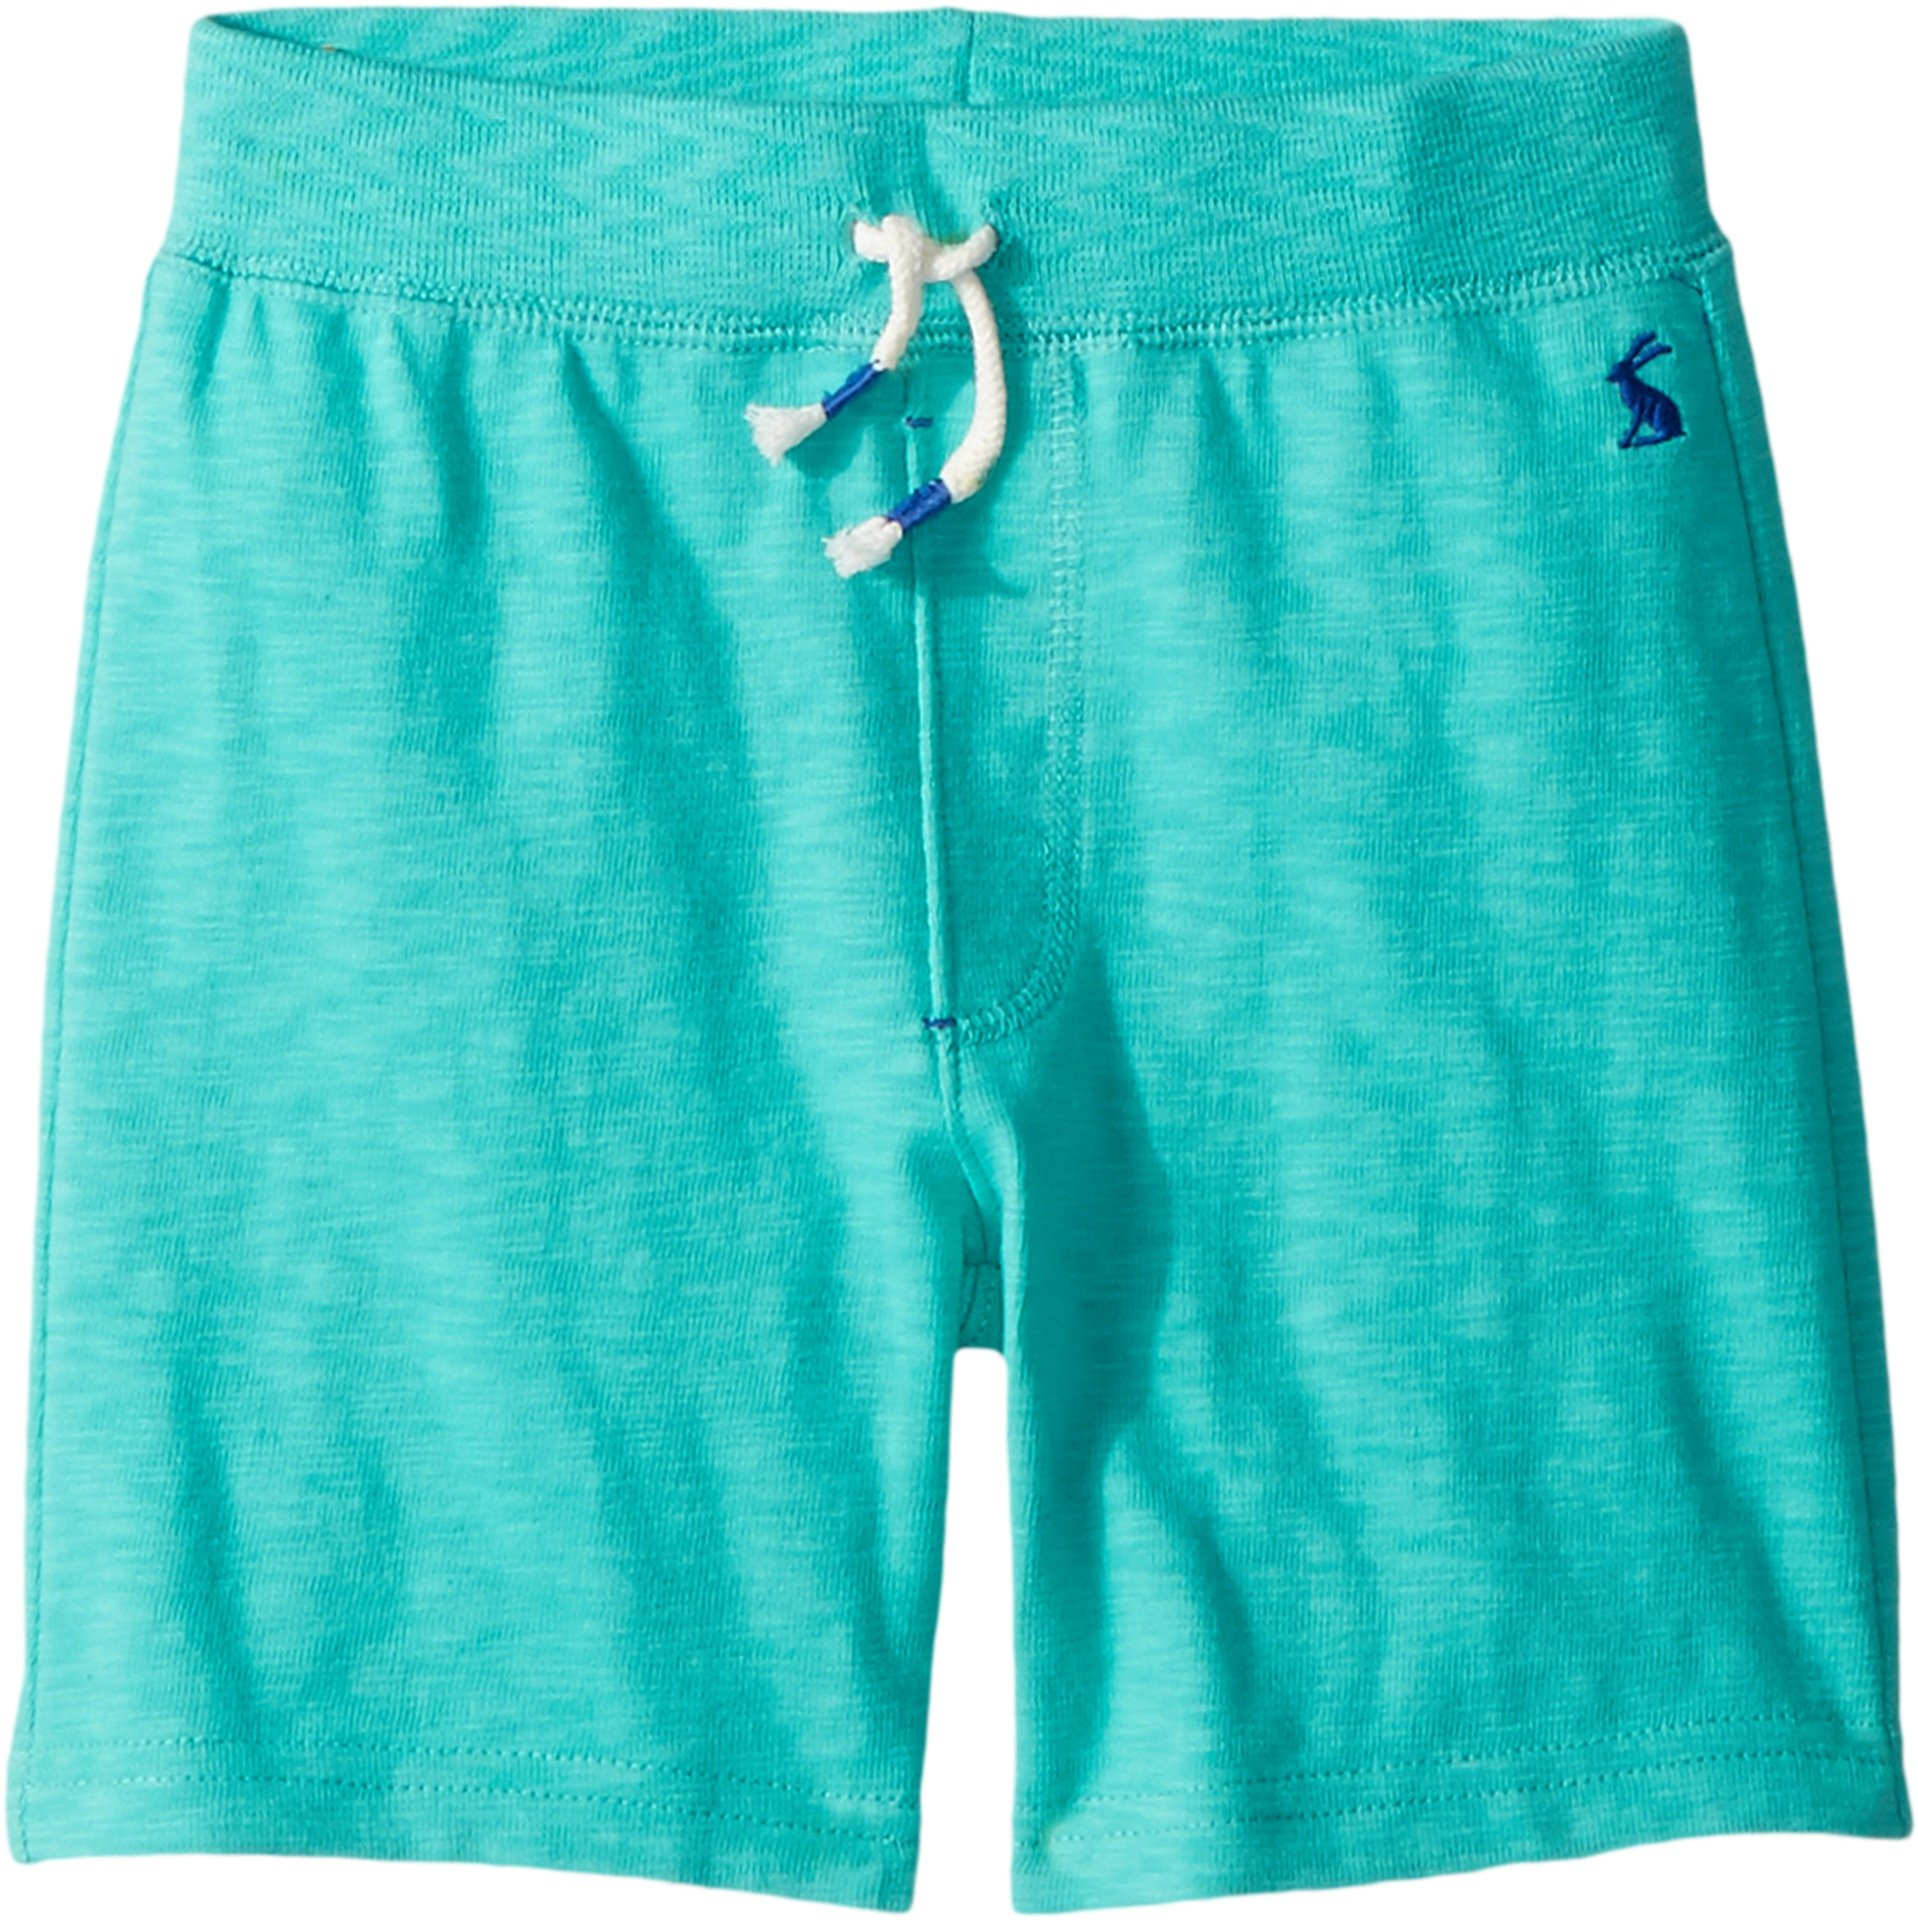 Joules Kids Baby Boy's Drawstring Jersey Shorts (Toddler/Little Kids) Turquoise 2